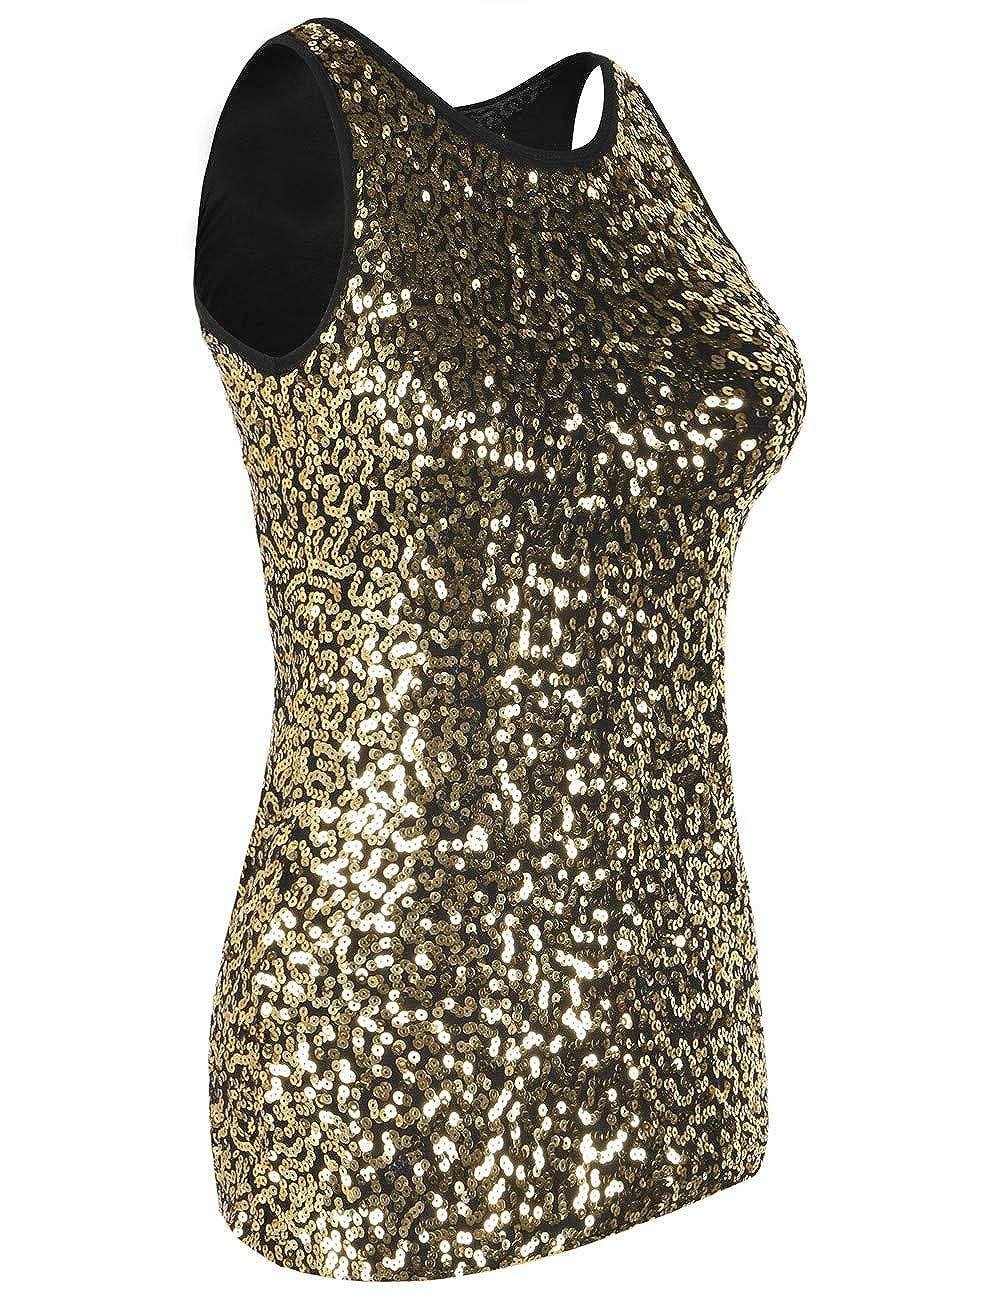 401f80e585d0ef Amazon.com  PrettyGuide Women s Full Sequin Tank Top Sleeveless Sparkle  Shimmer Vest Tops Clubwear  Clothing